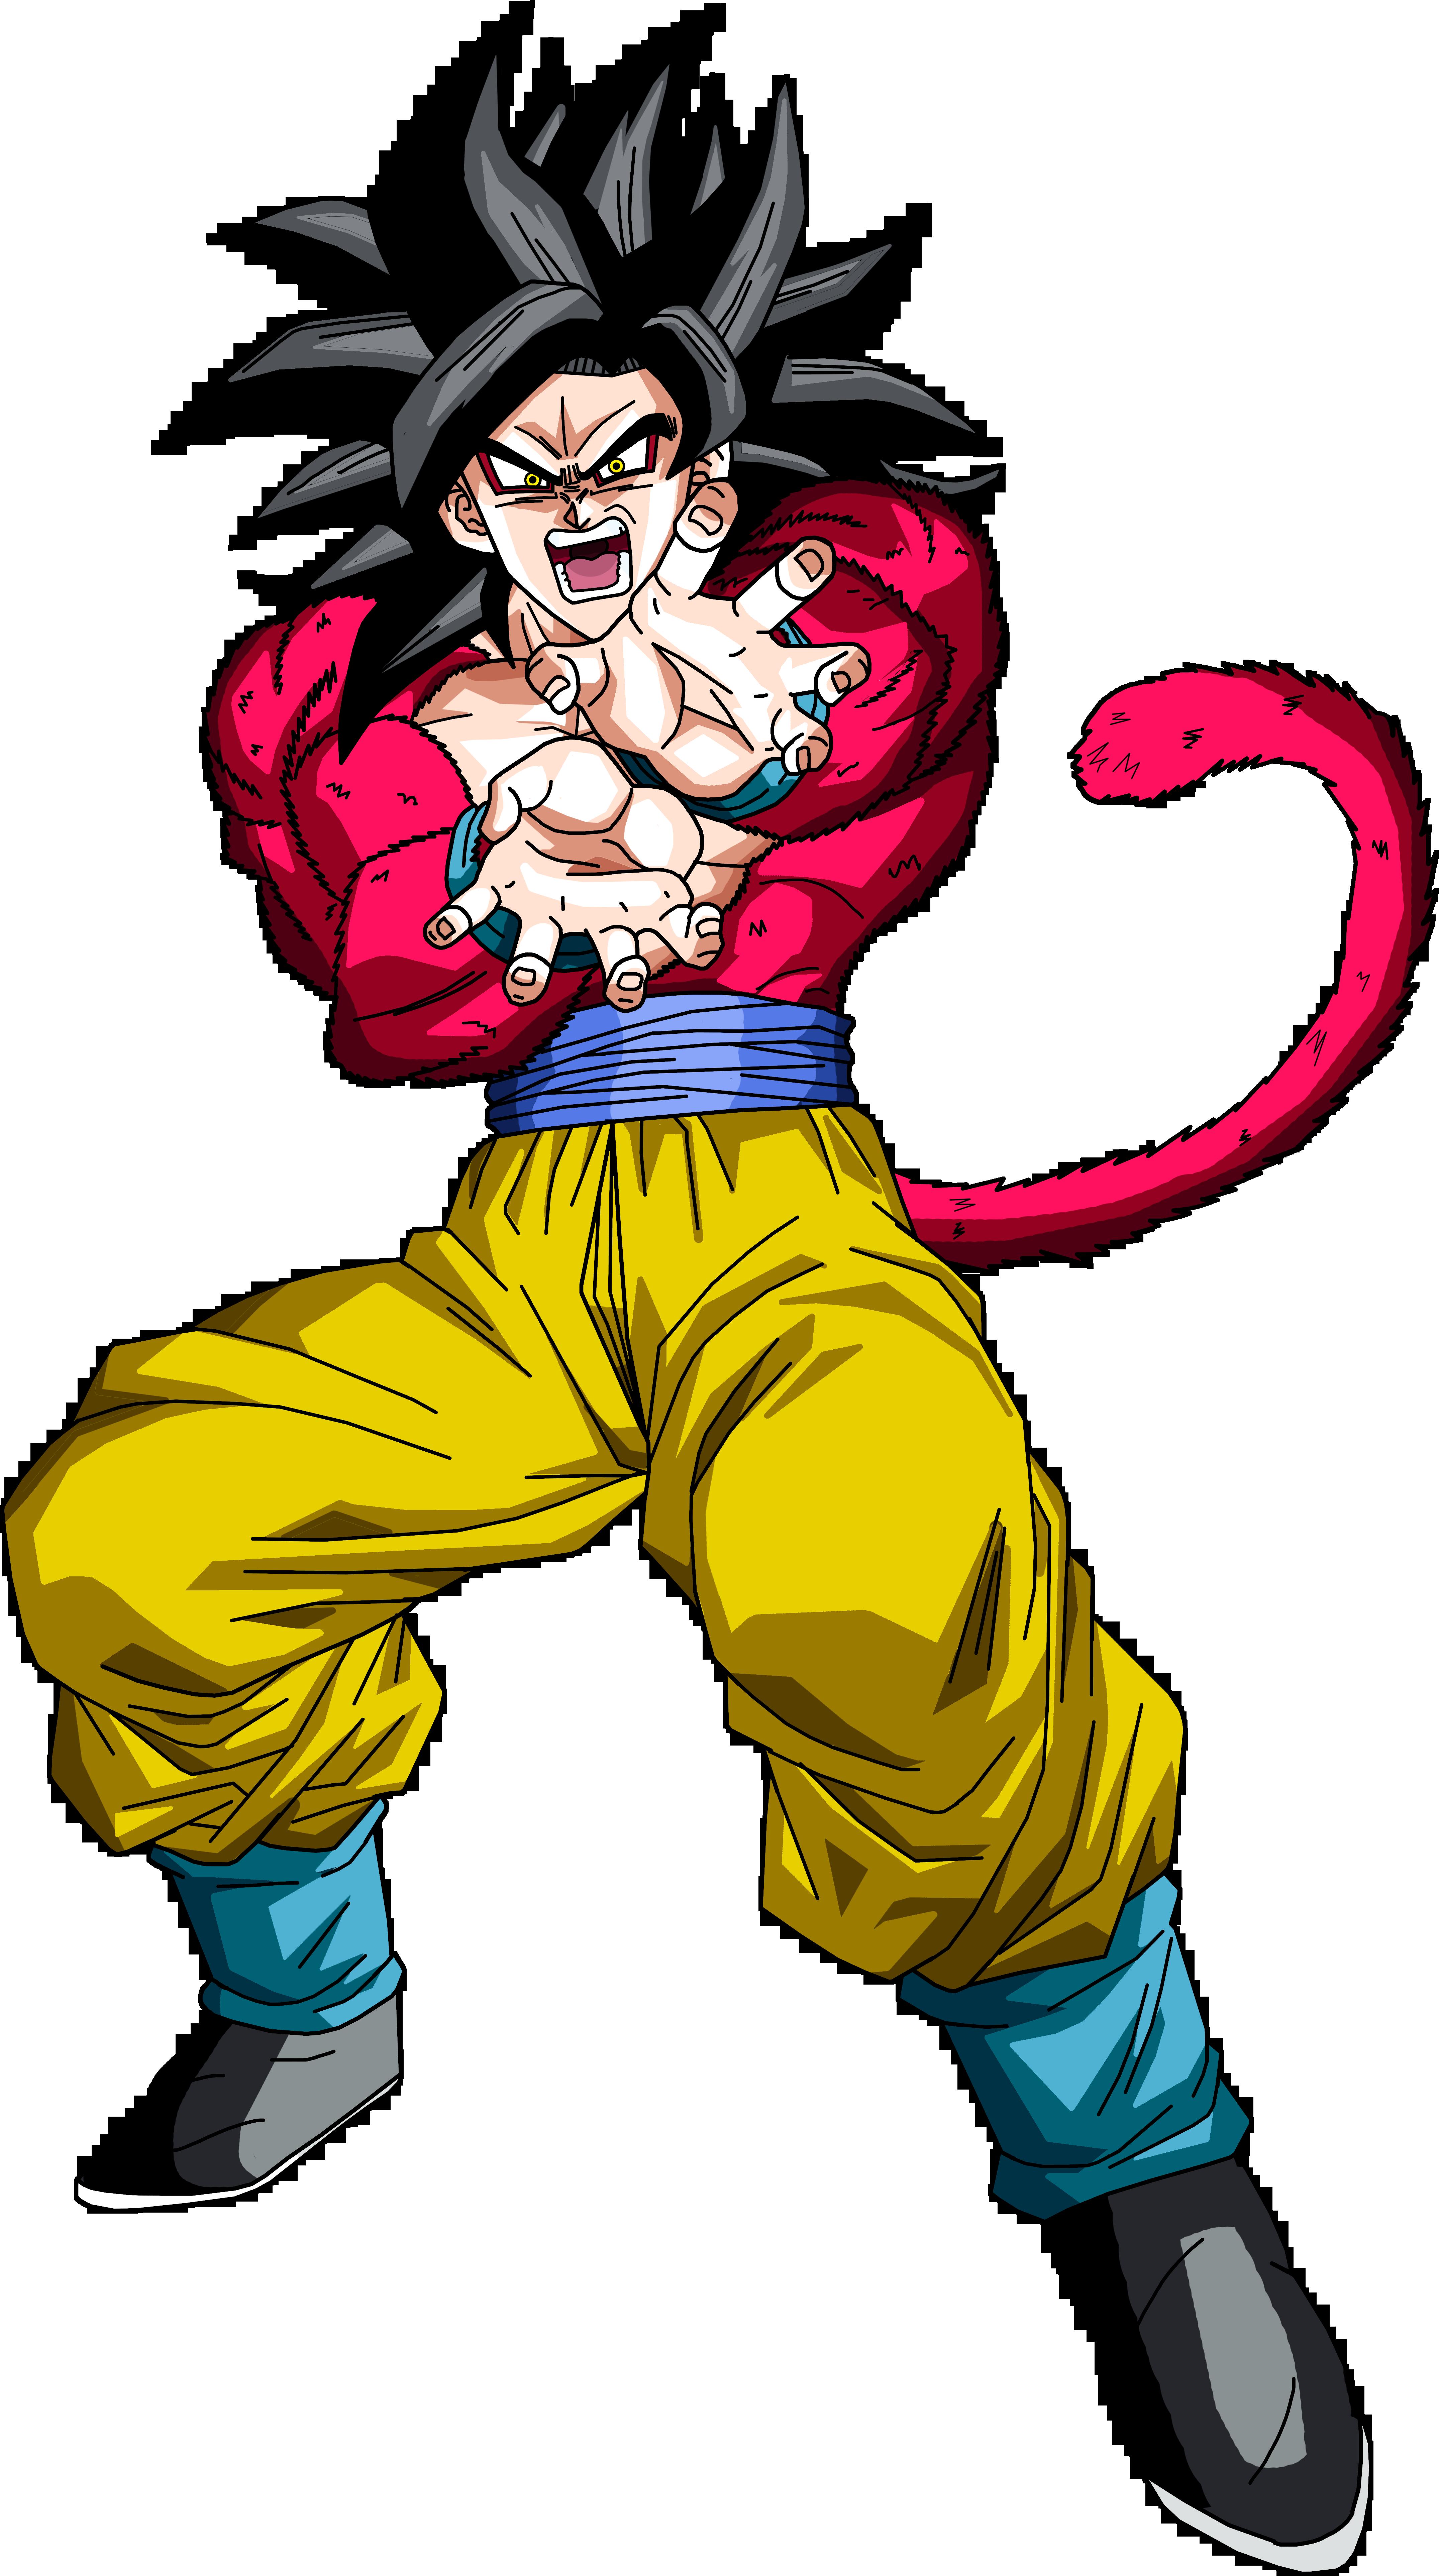 Super Saiyan 4 Goku by BrusselTheSaiyan on DeviantArt